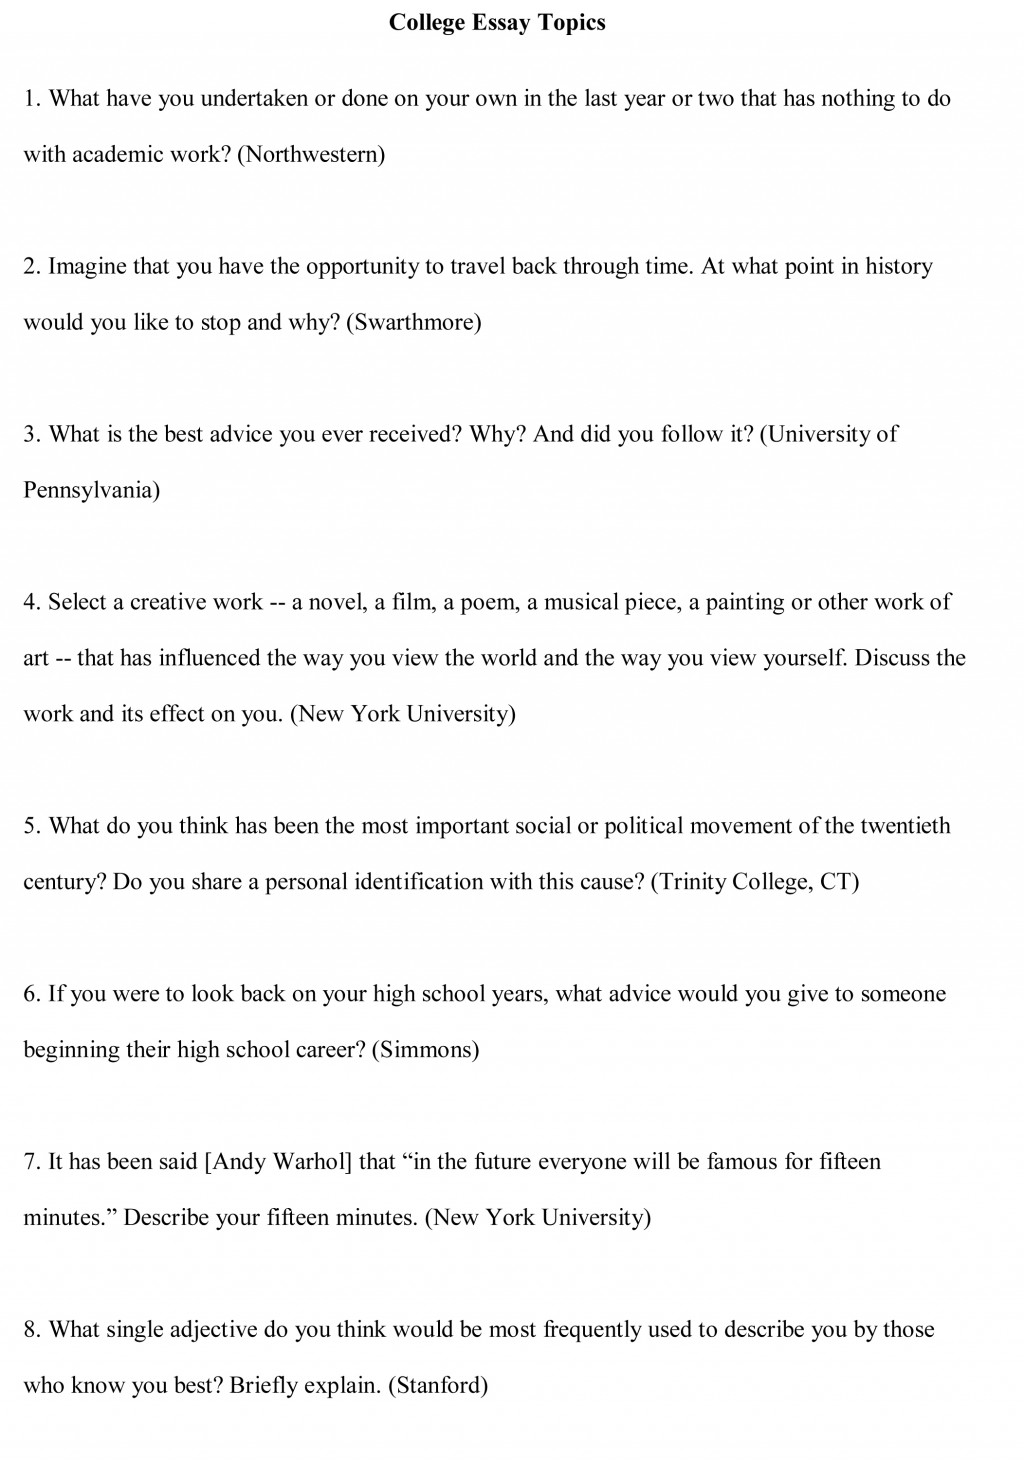 001 College Essay Topics Free Sample1 Example Marvelous Creative List Interesting 2018 Large